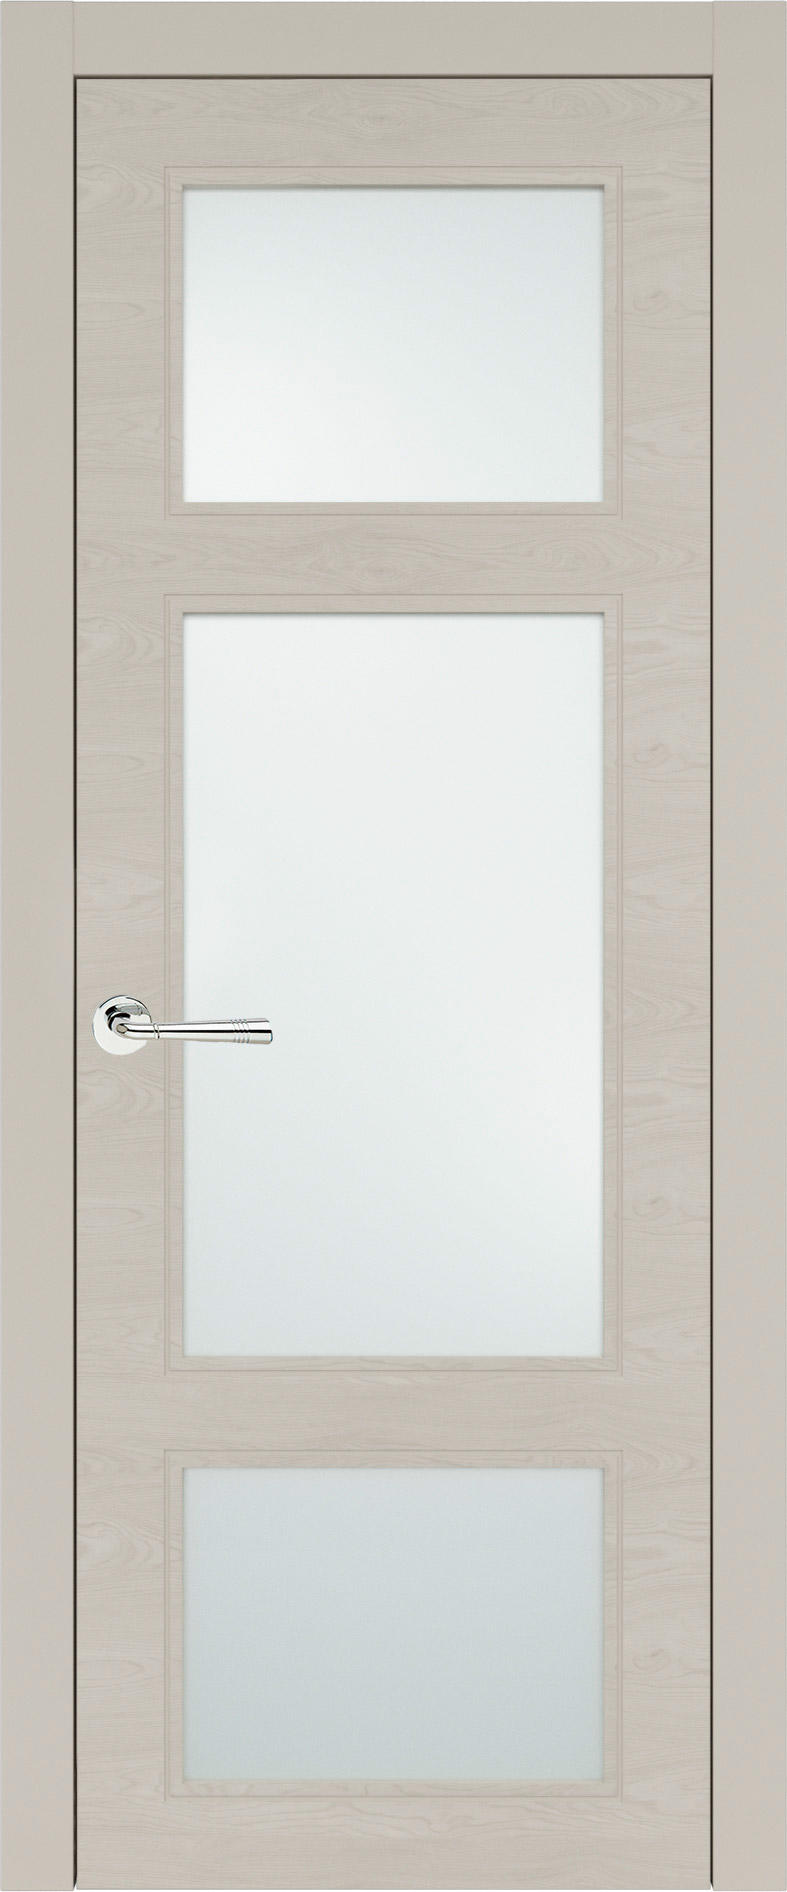 Siena Neo Classic цвет - Жемчужная эмаль по шпону (RAL 1013) Со стеклом (ДО)